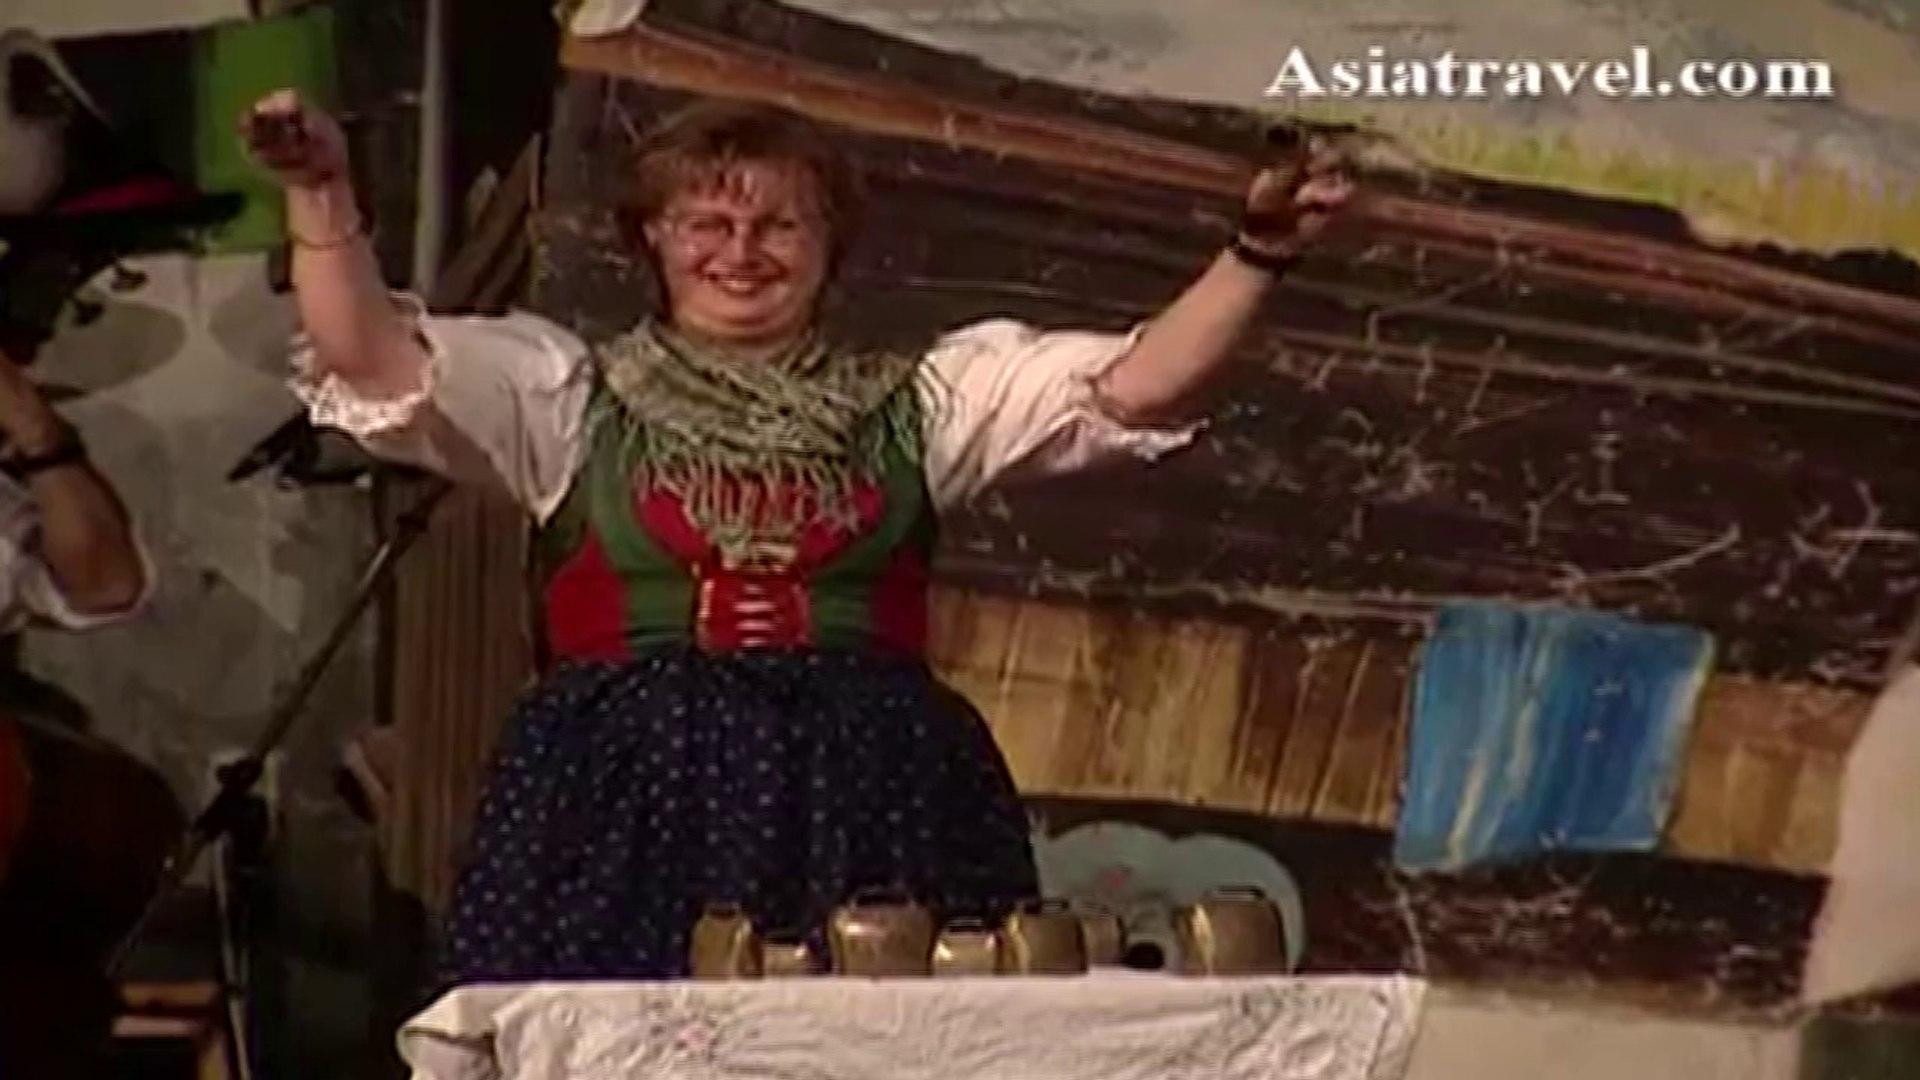 Austrian Folk Dance Holiday, Austrian by Asiatravel.com